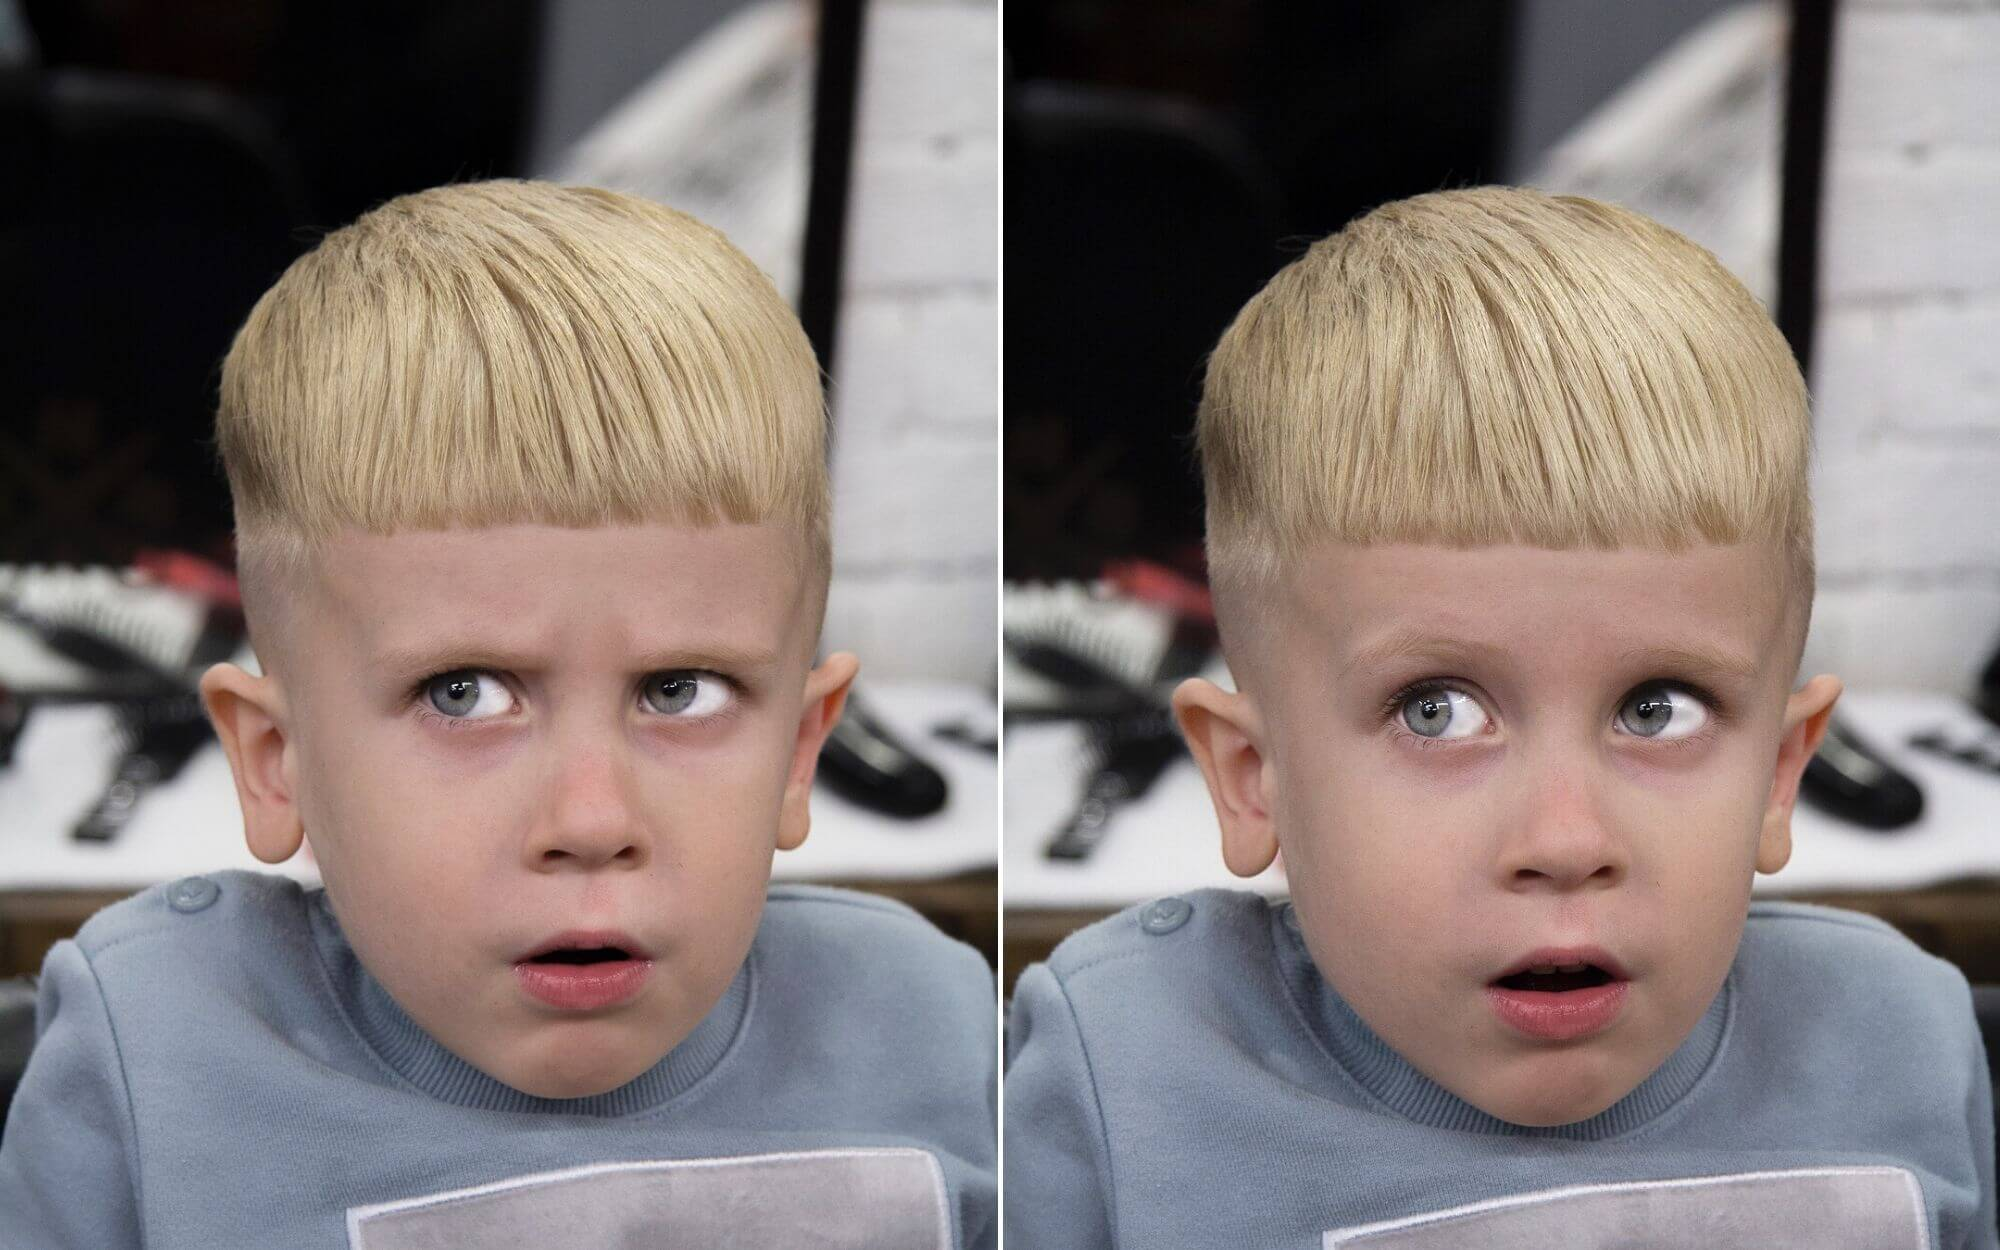 Classic Undercut Haircut for Boys